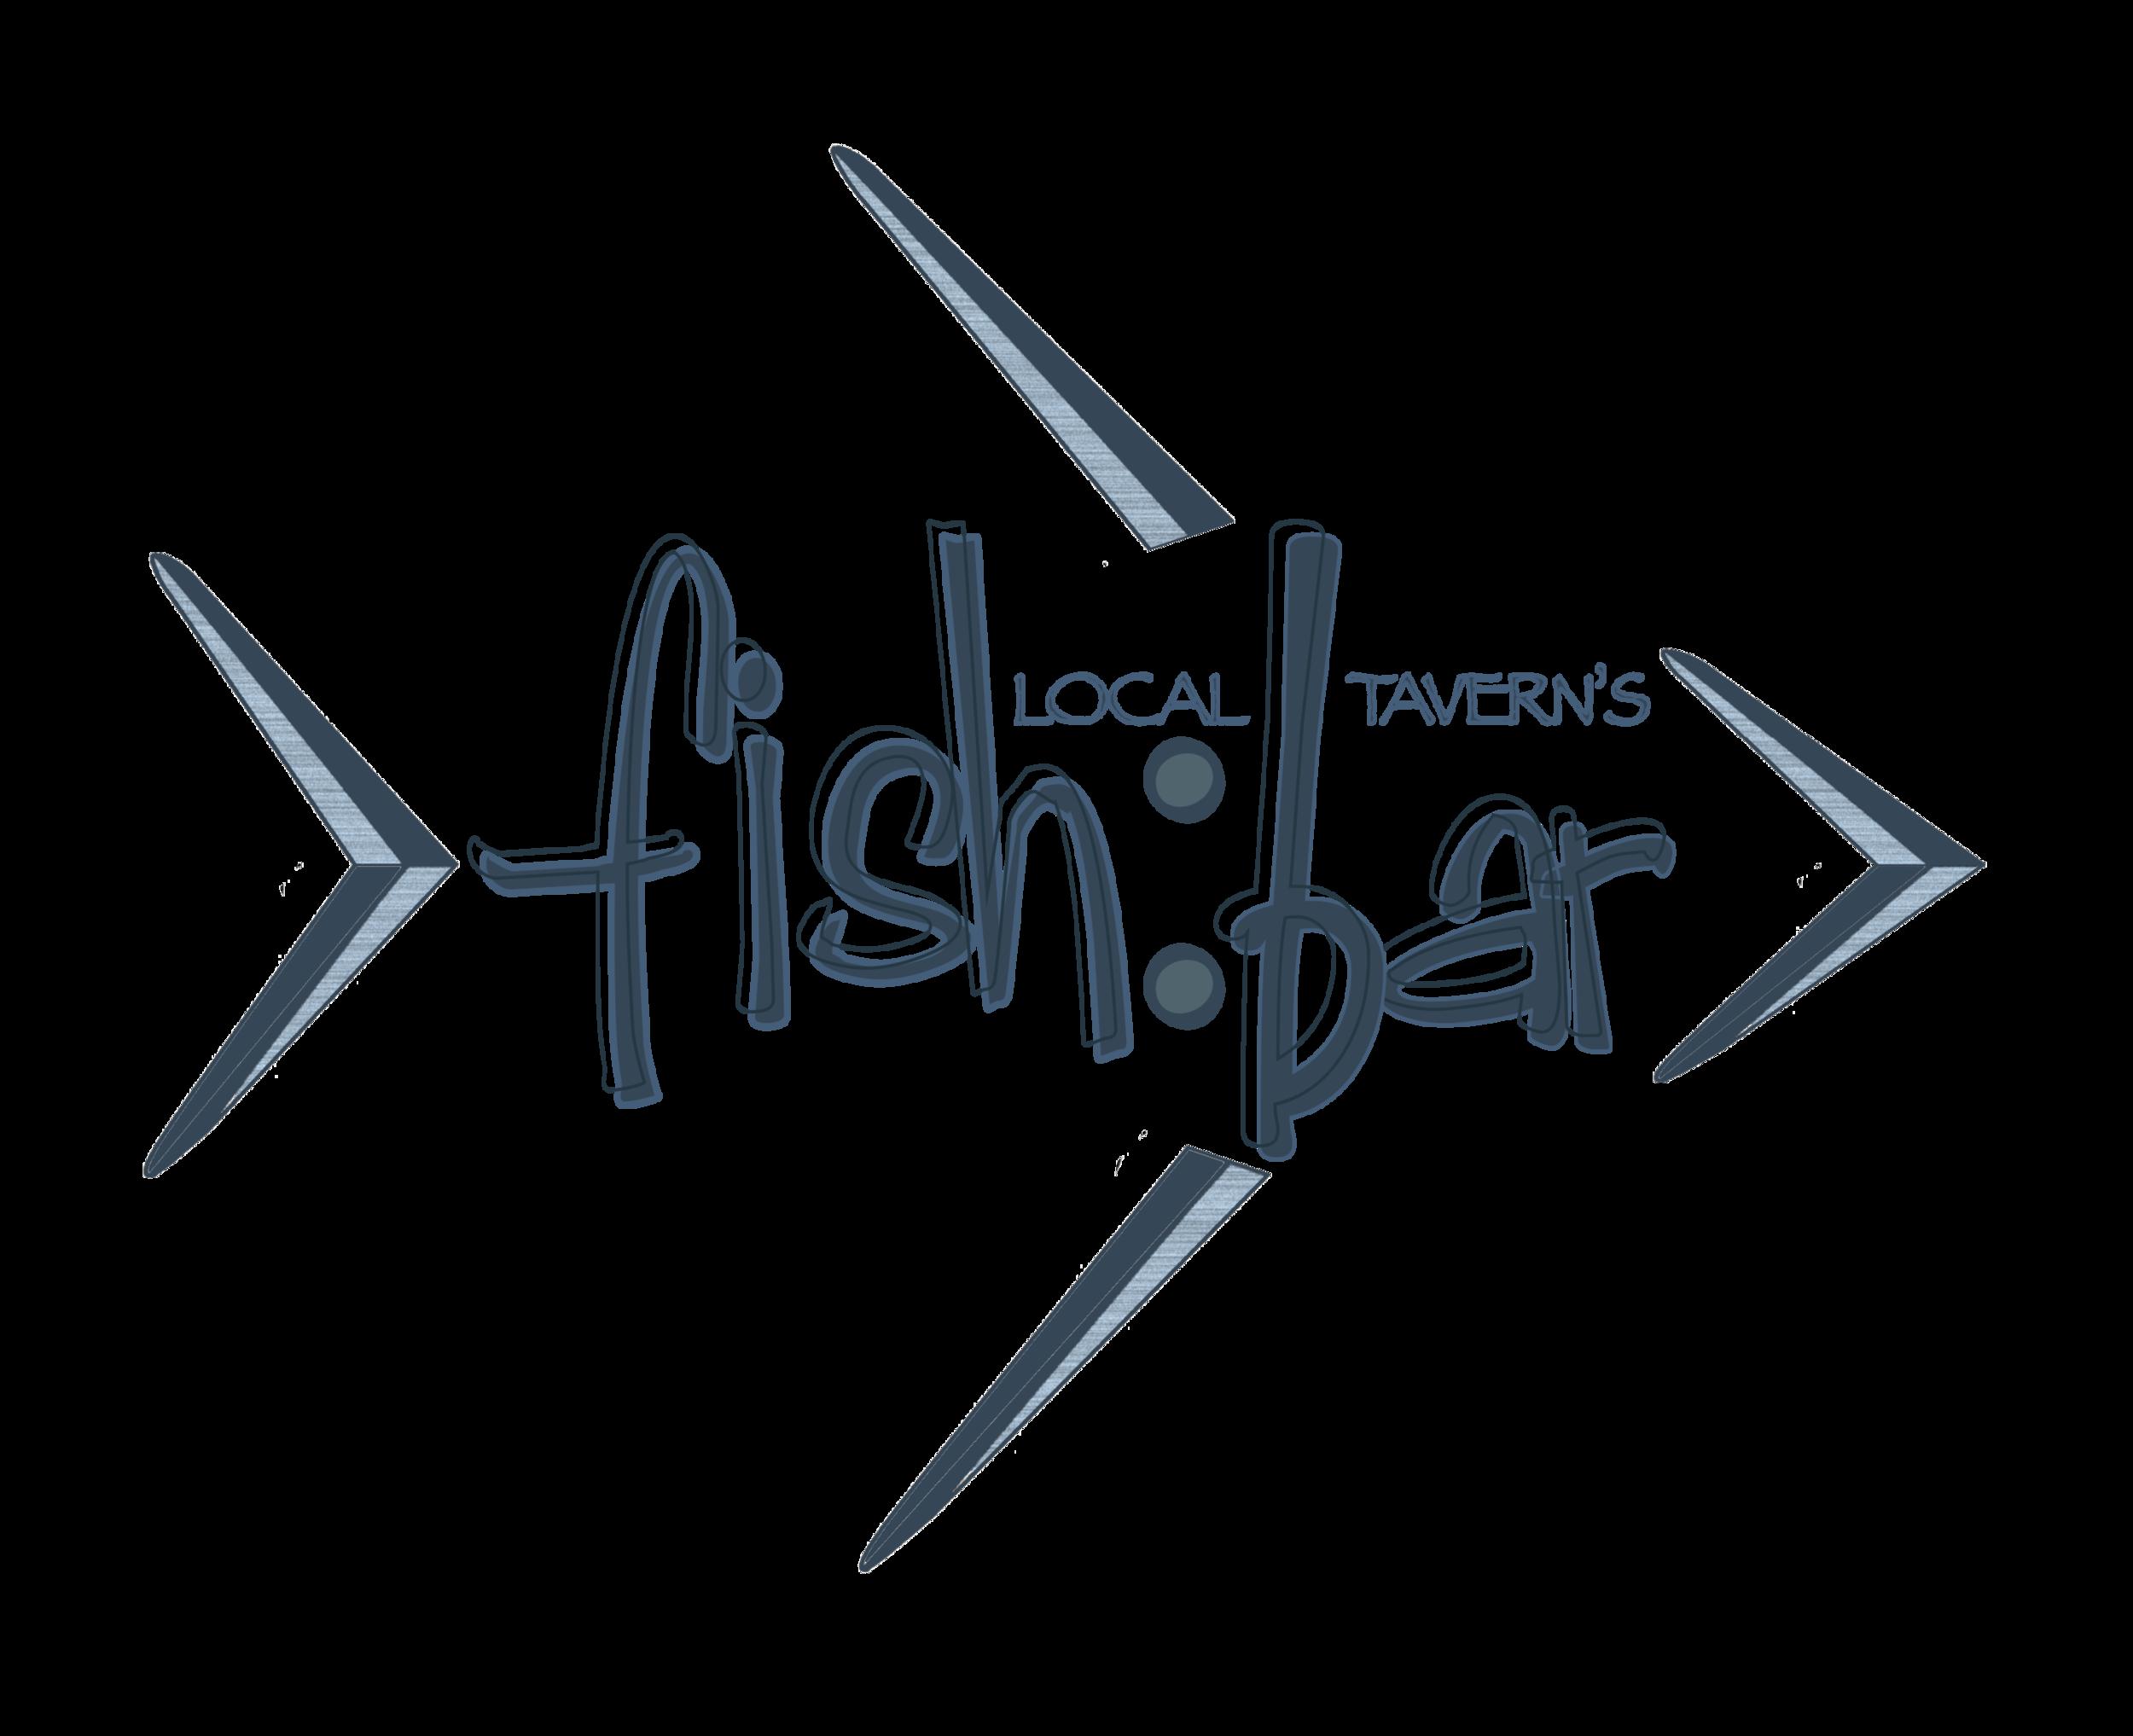 FISHBAR_LOGO2.png